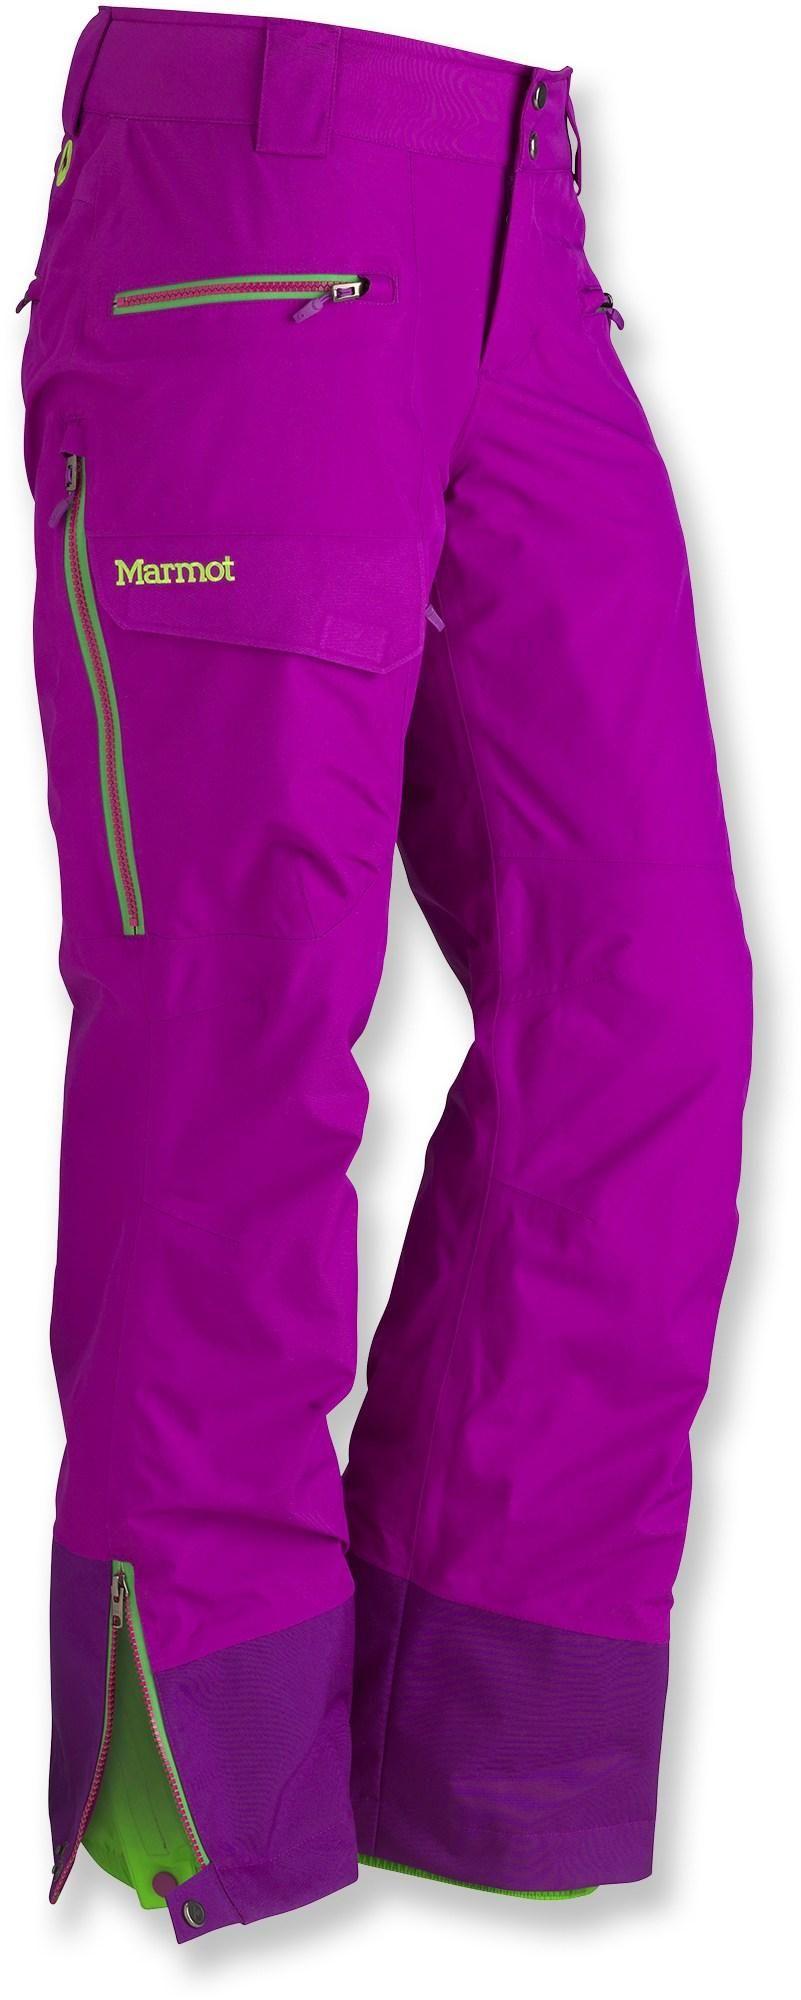 Marmot Freerider Insulated Pants - Women's.